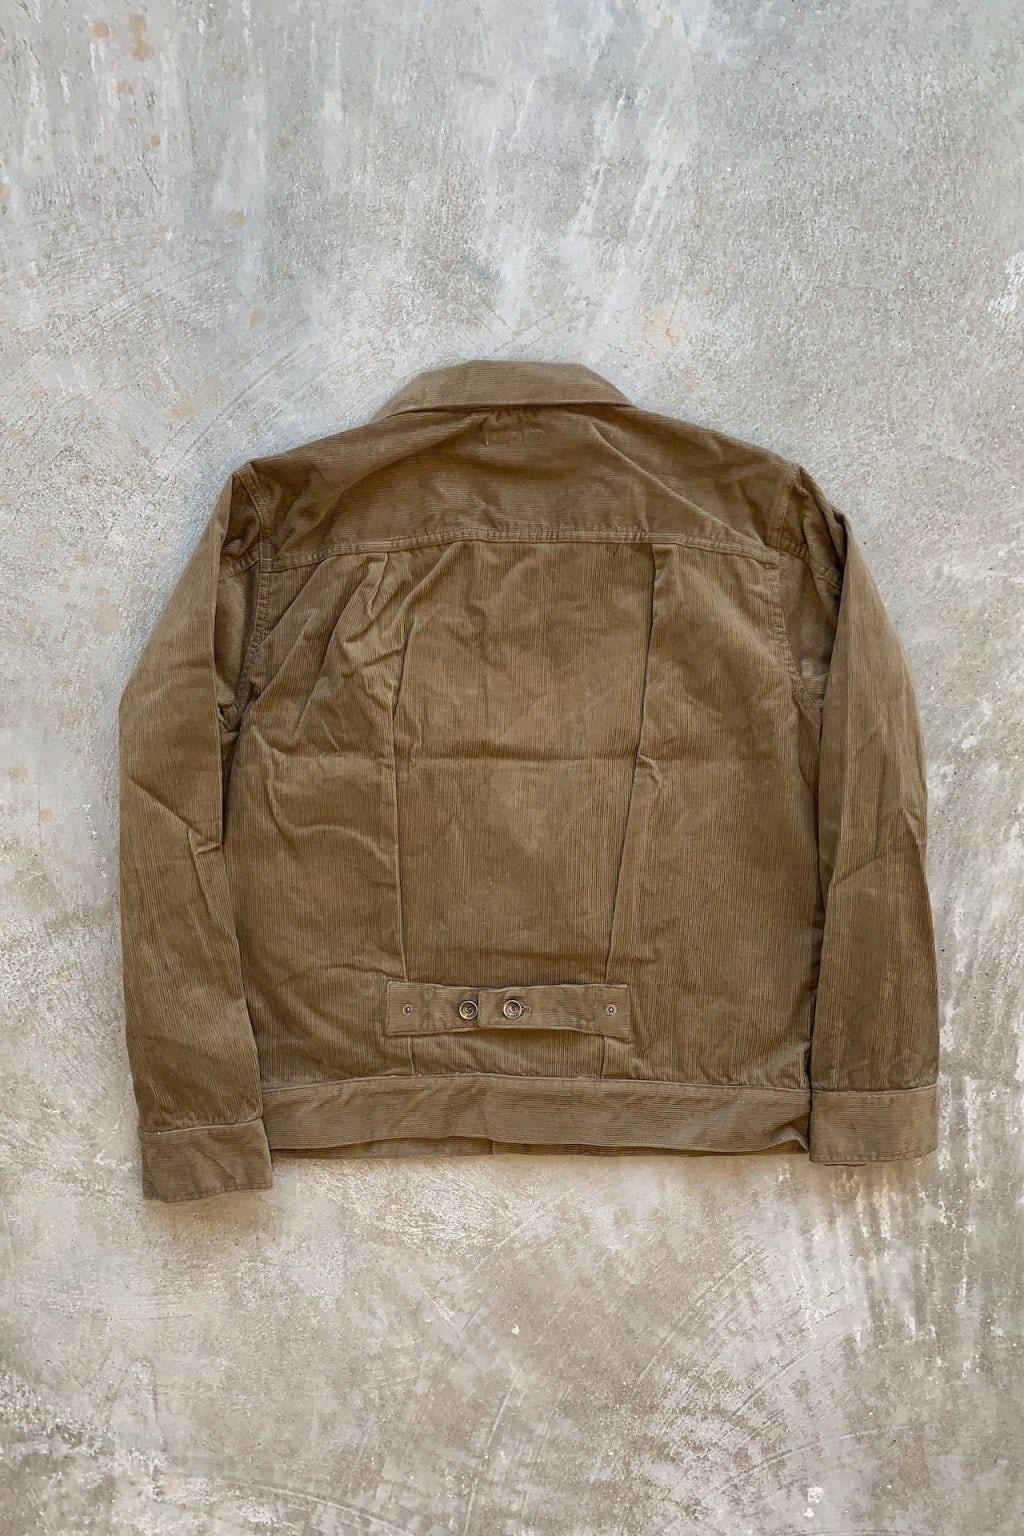 Engineered Garments Trucker Jacket Khaki 14W